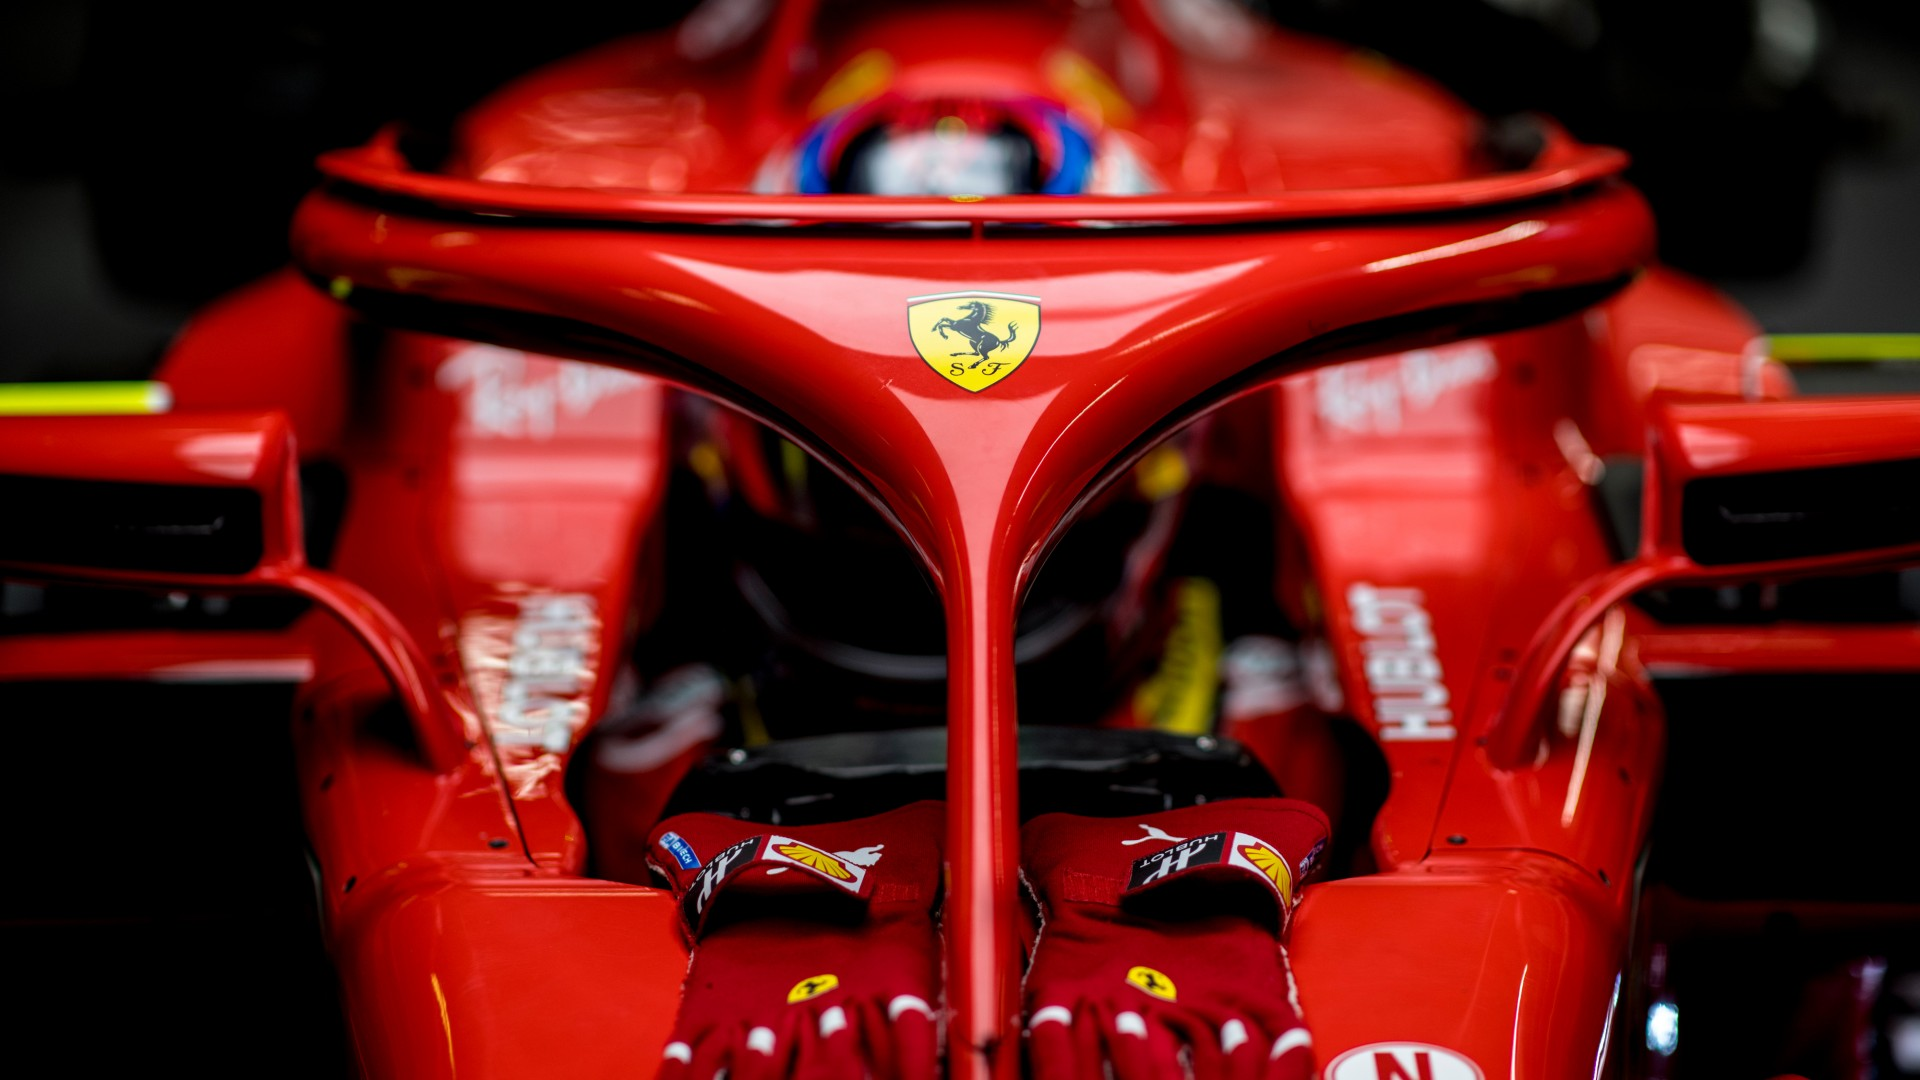 2018 Ferrari Sf71h F1 Formula 1 4k 3 Wallpaper Hd Car